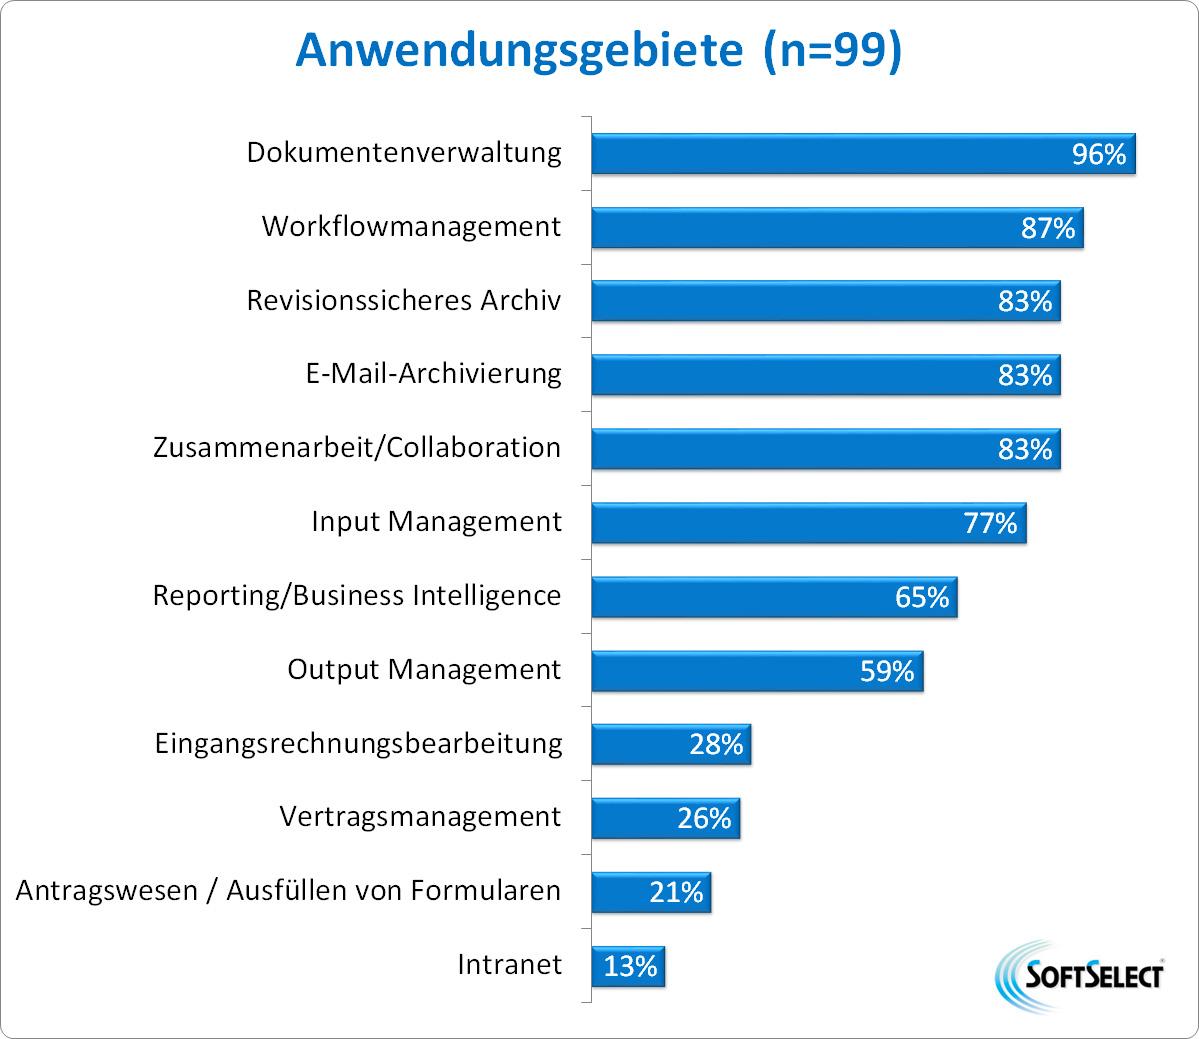 Anwendungsgebiete von DMS-/ECM-Software (Quelle: SoftSelect GmbH)